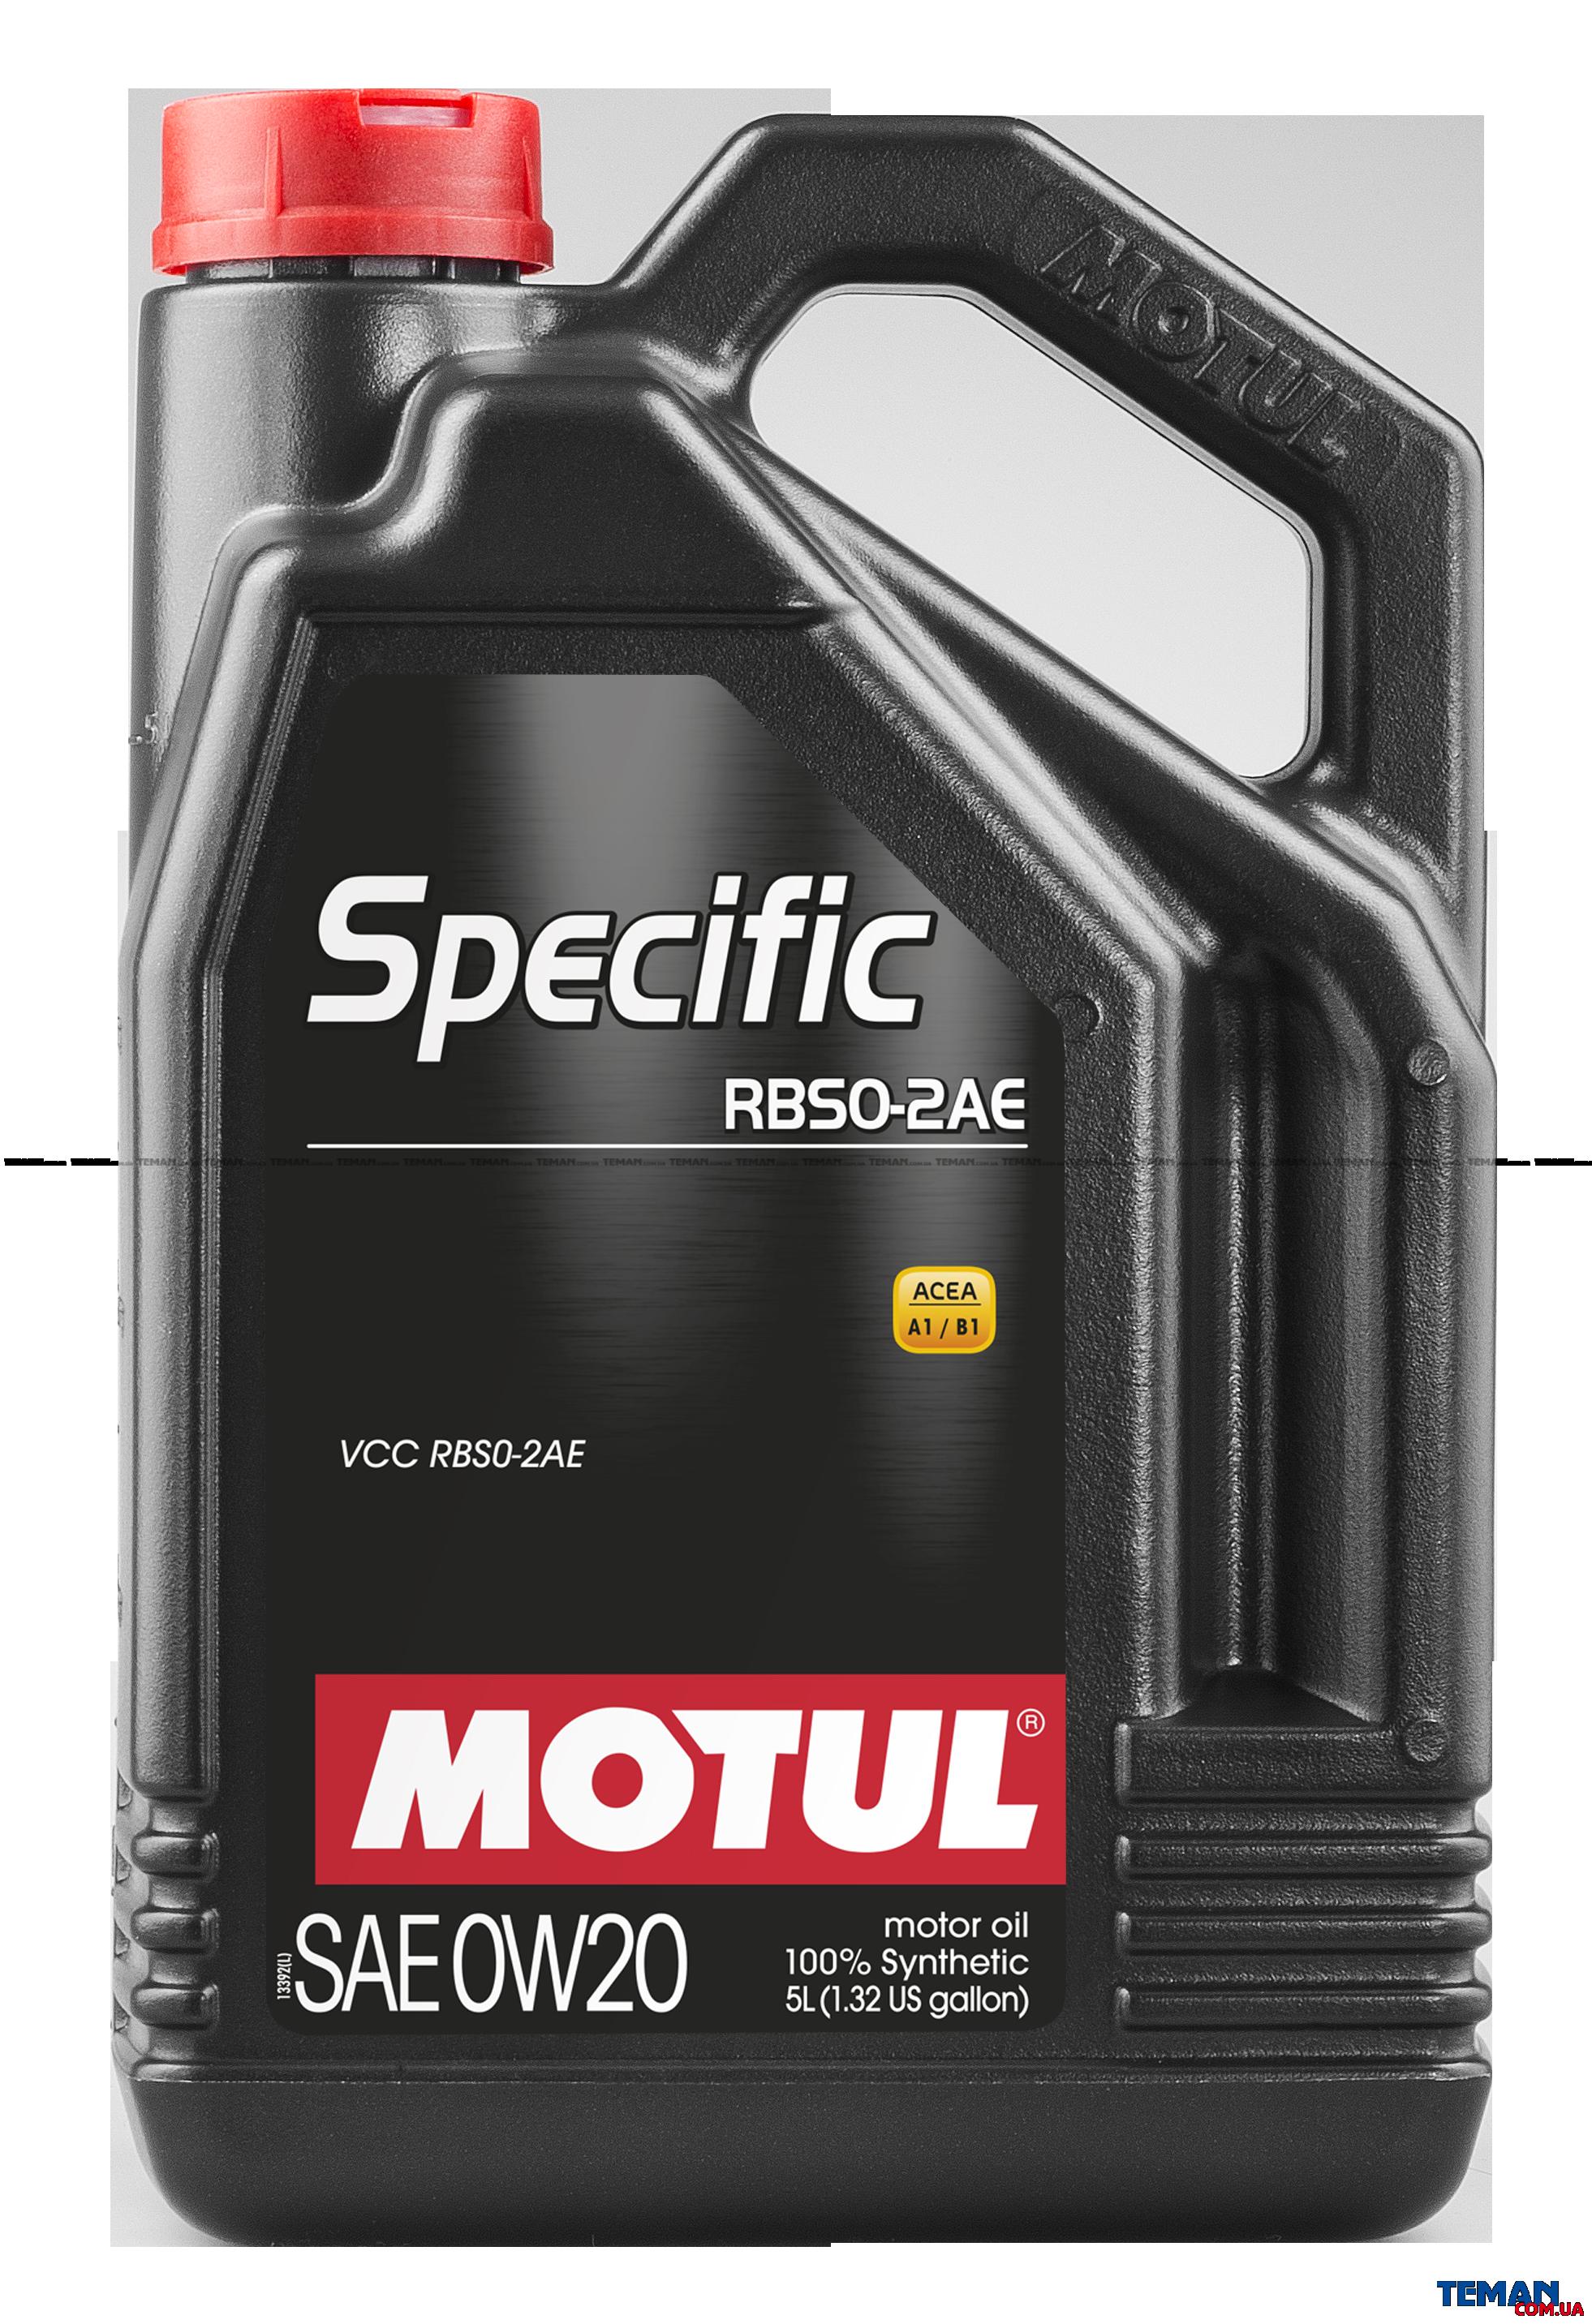 Синтетическое моторное масло SPECIFIC RBS0-2AE 0W-20, 5 л